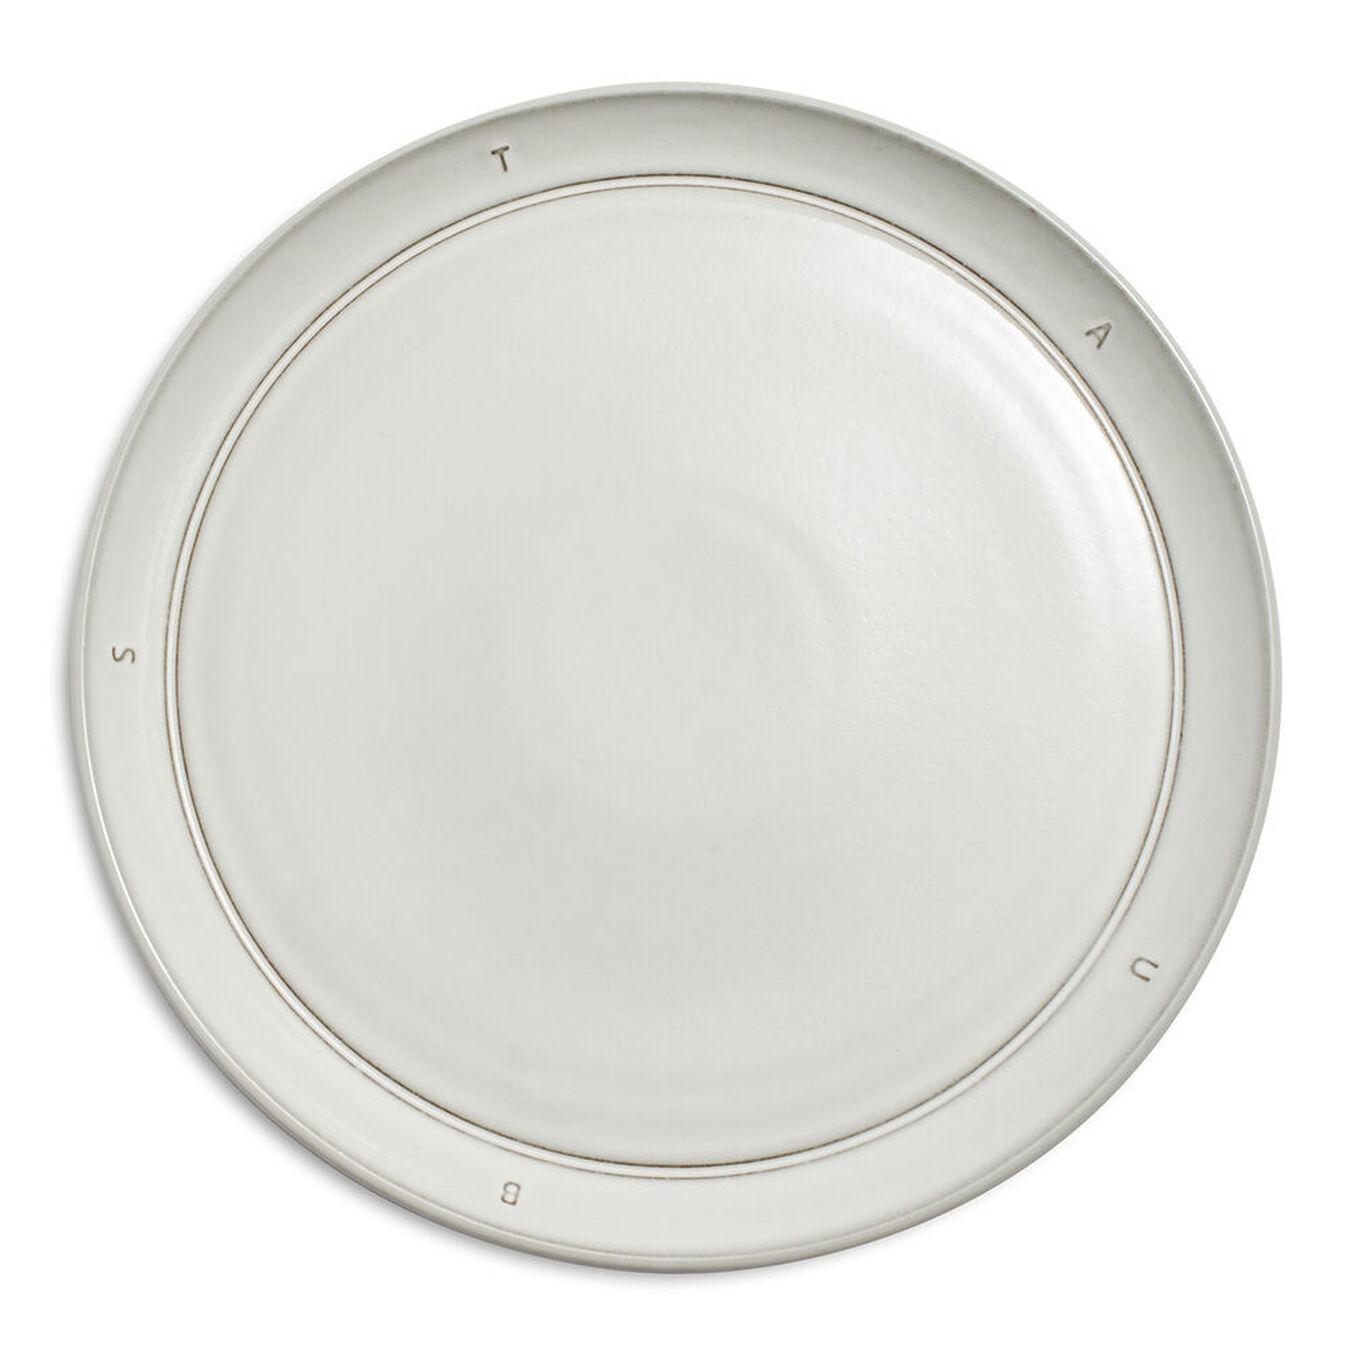 12-pc Dinnerware Set,,large 4